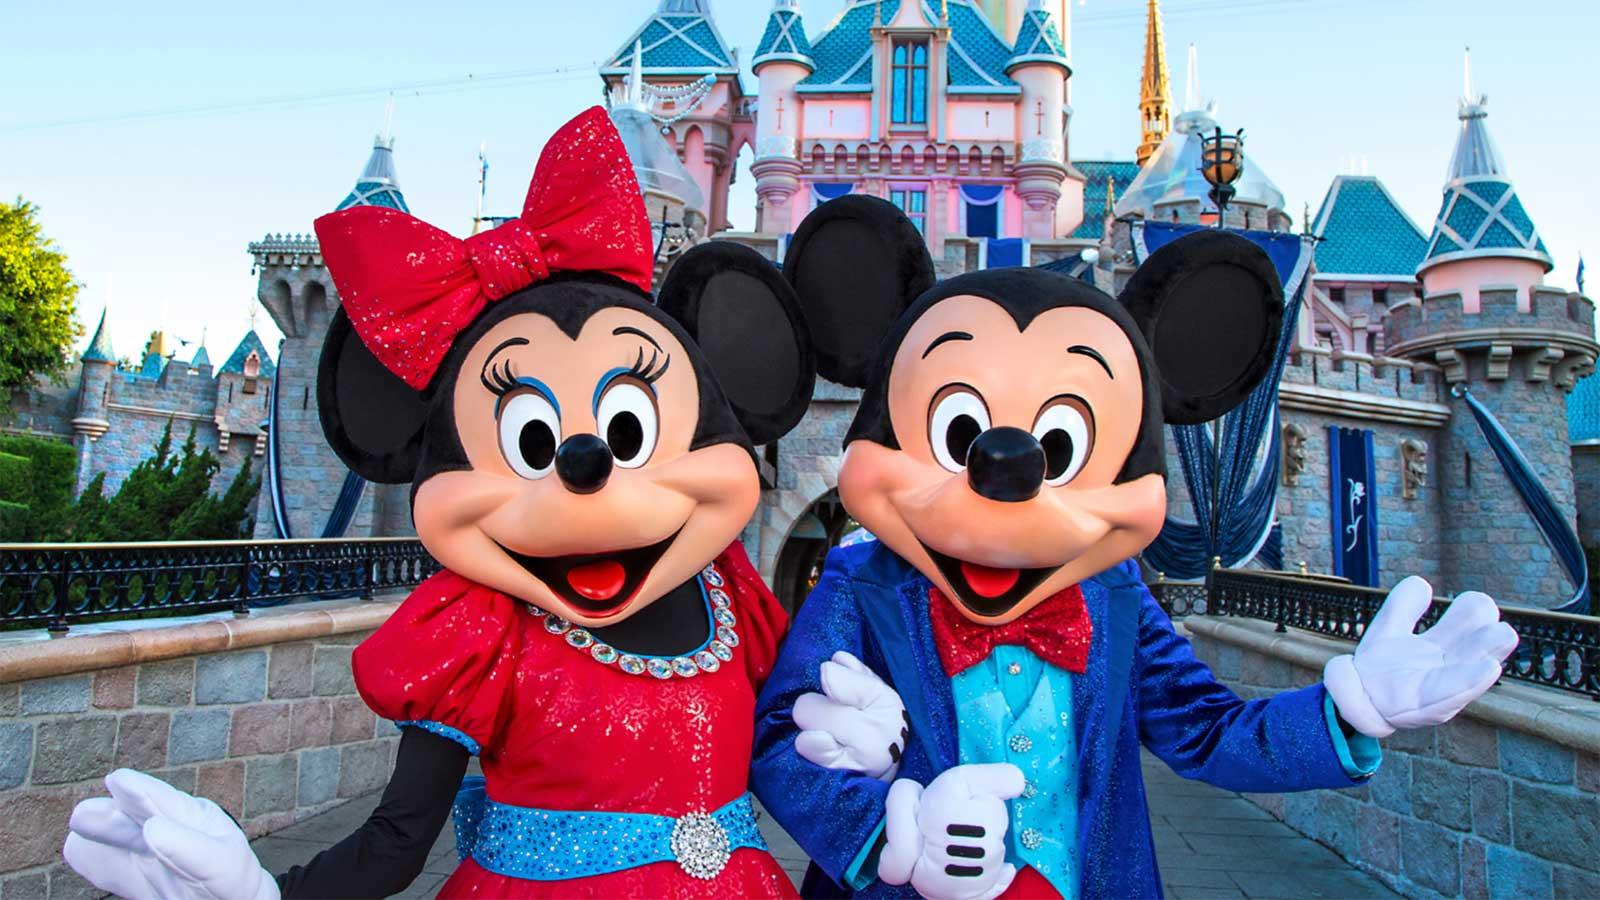 segredos que a disney esconde, curiosidades da Disneylândia